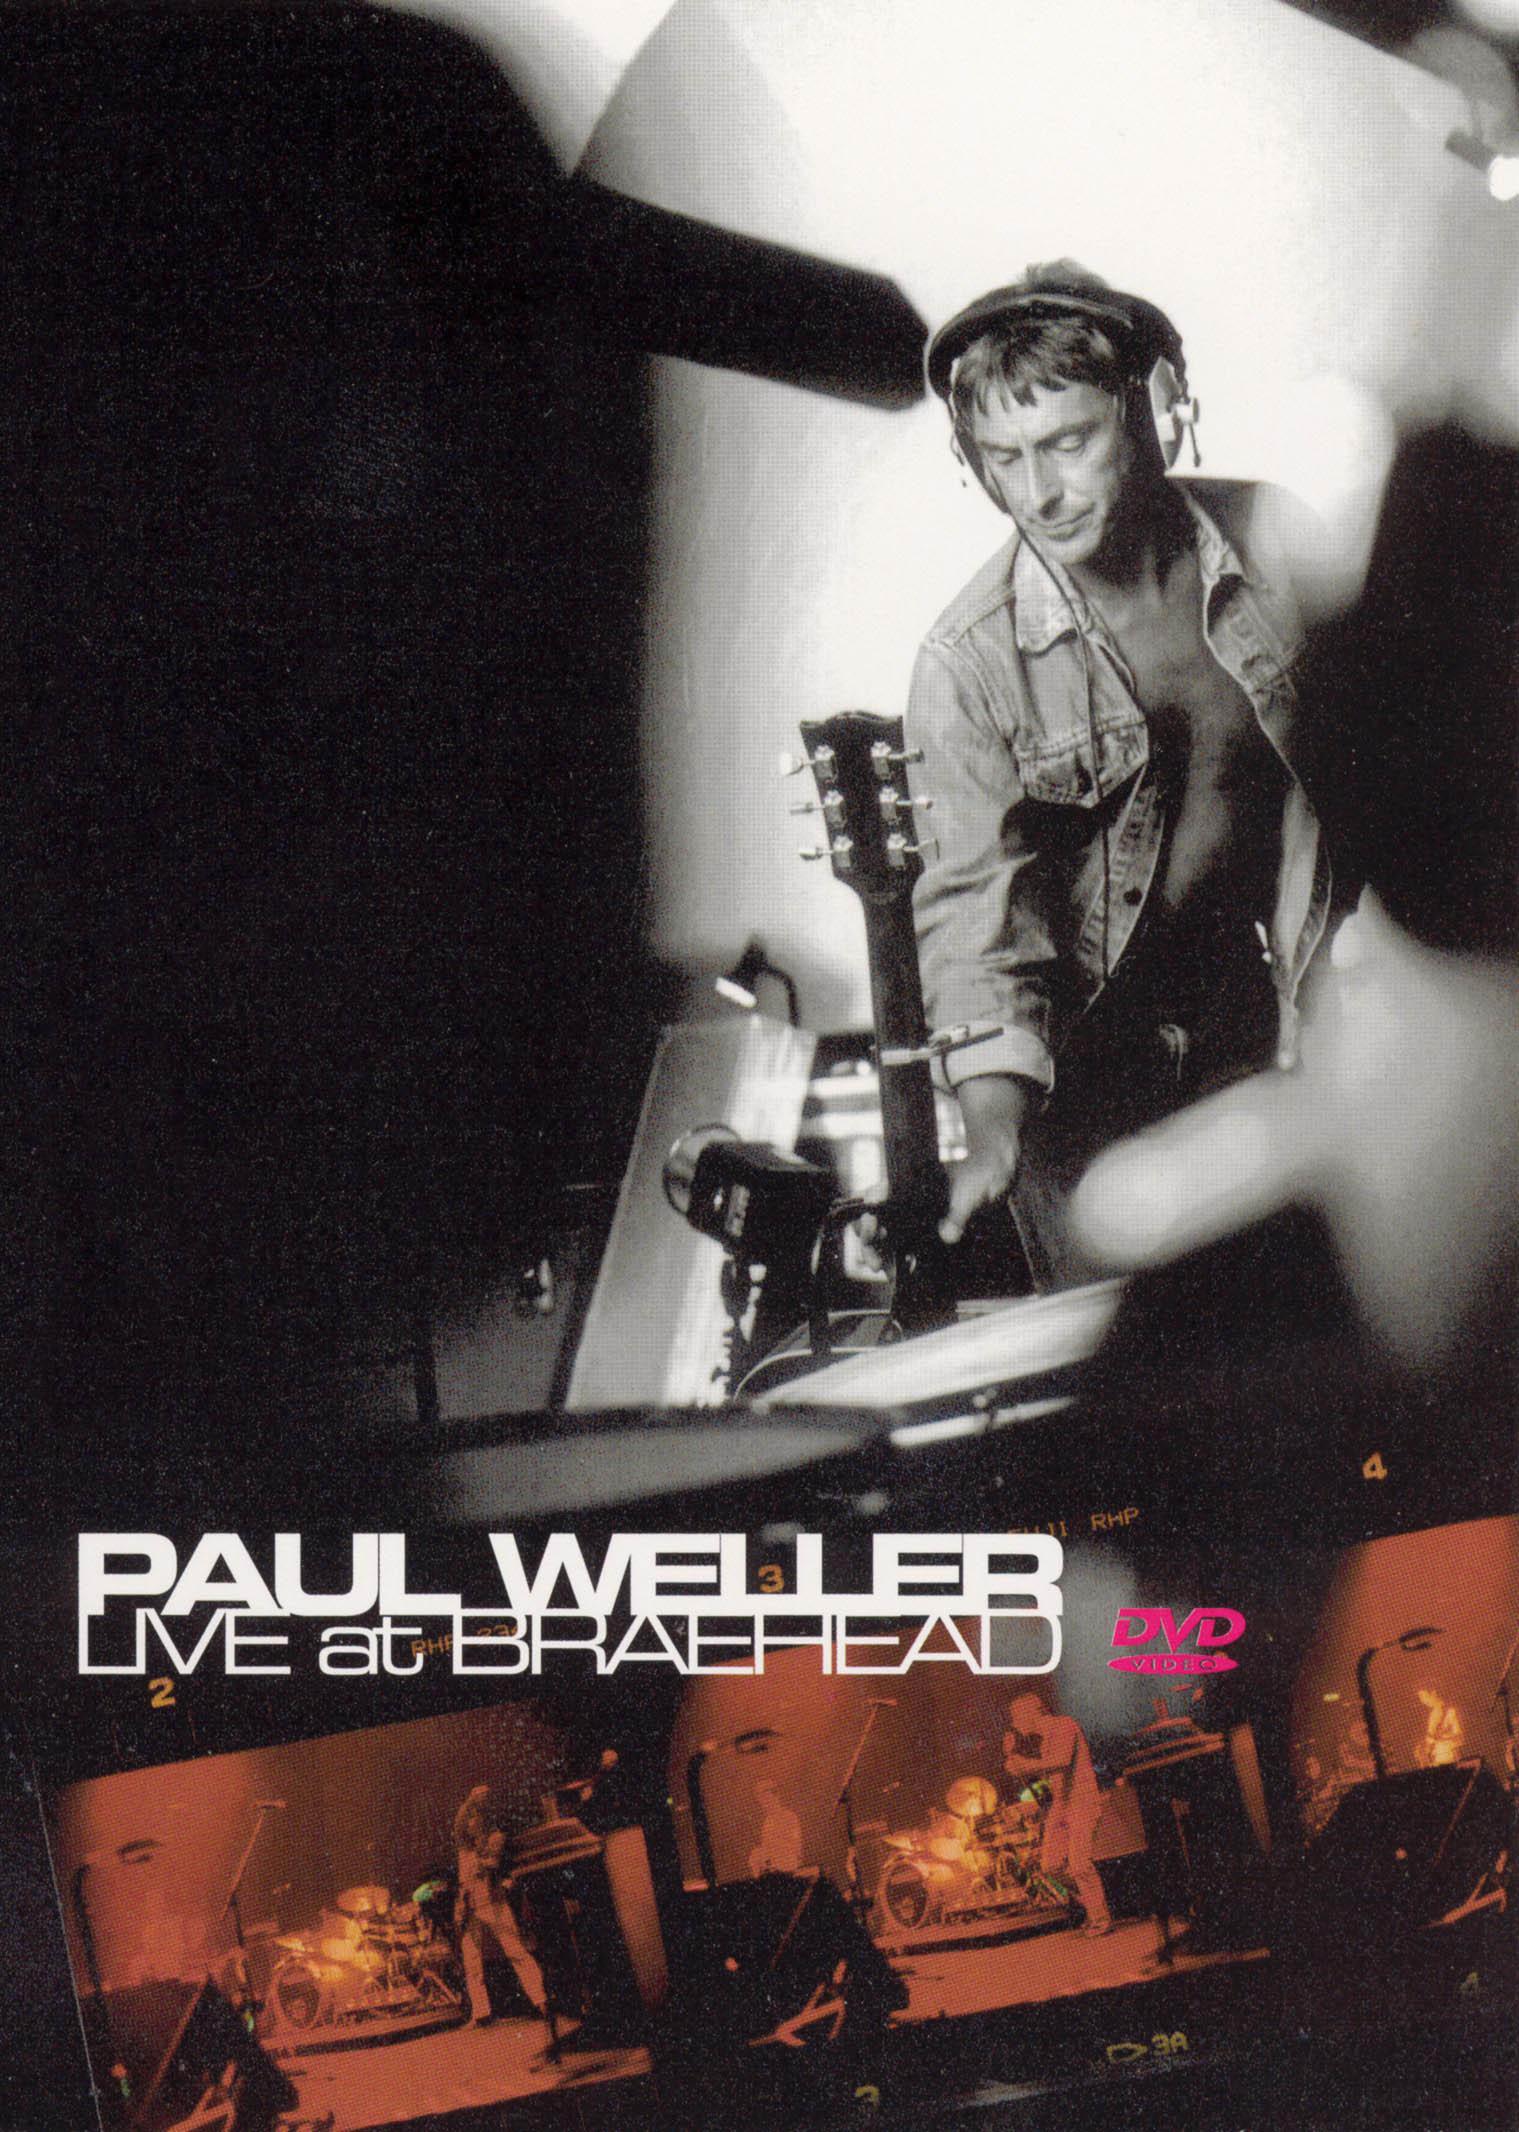 Paul Weller: Live at Braehead